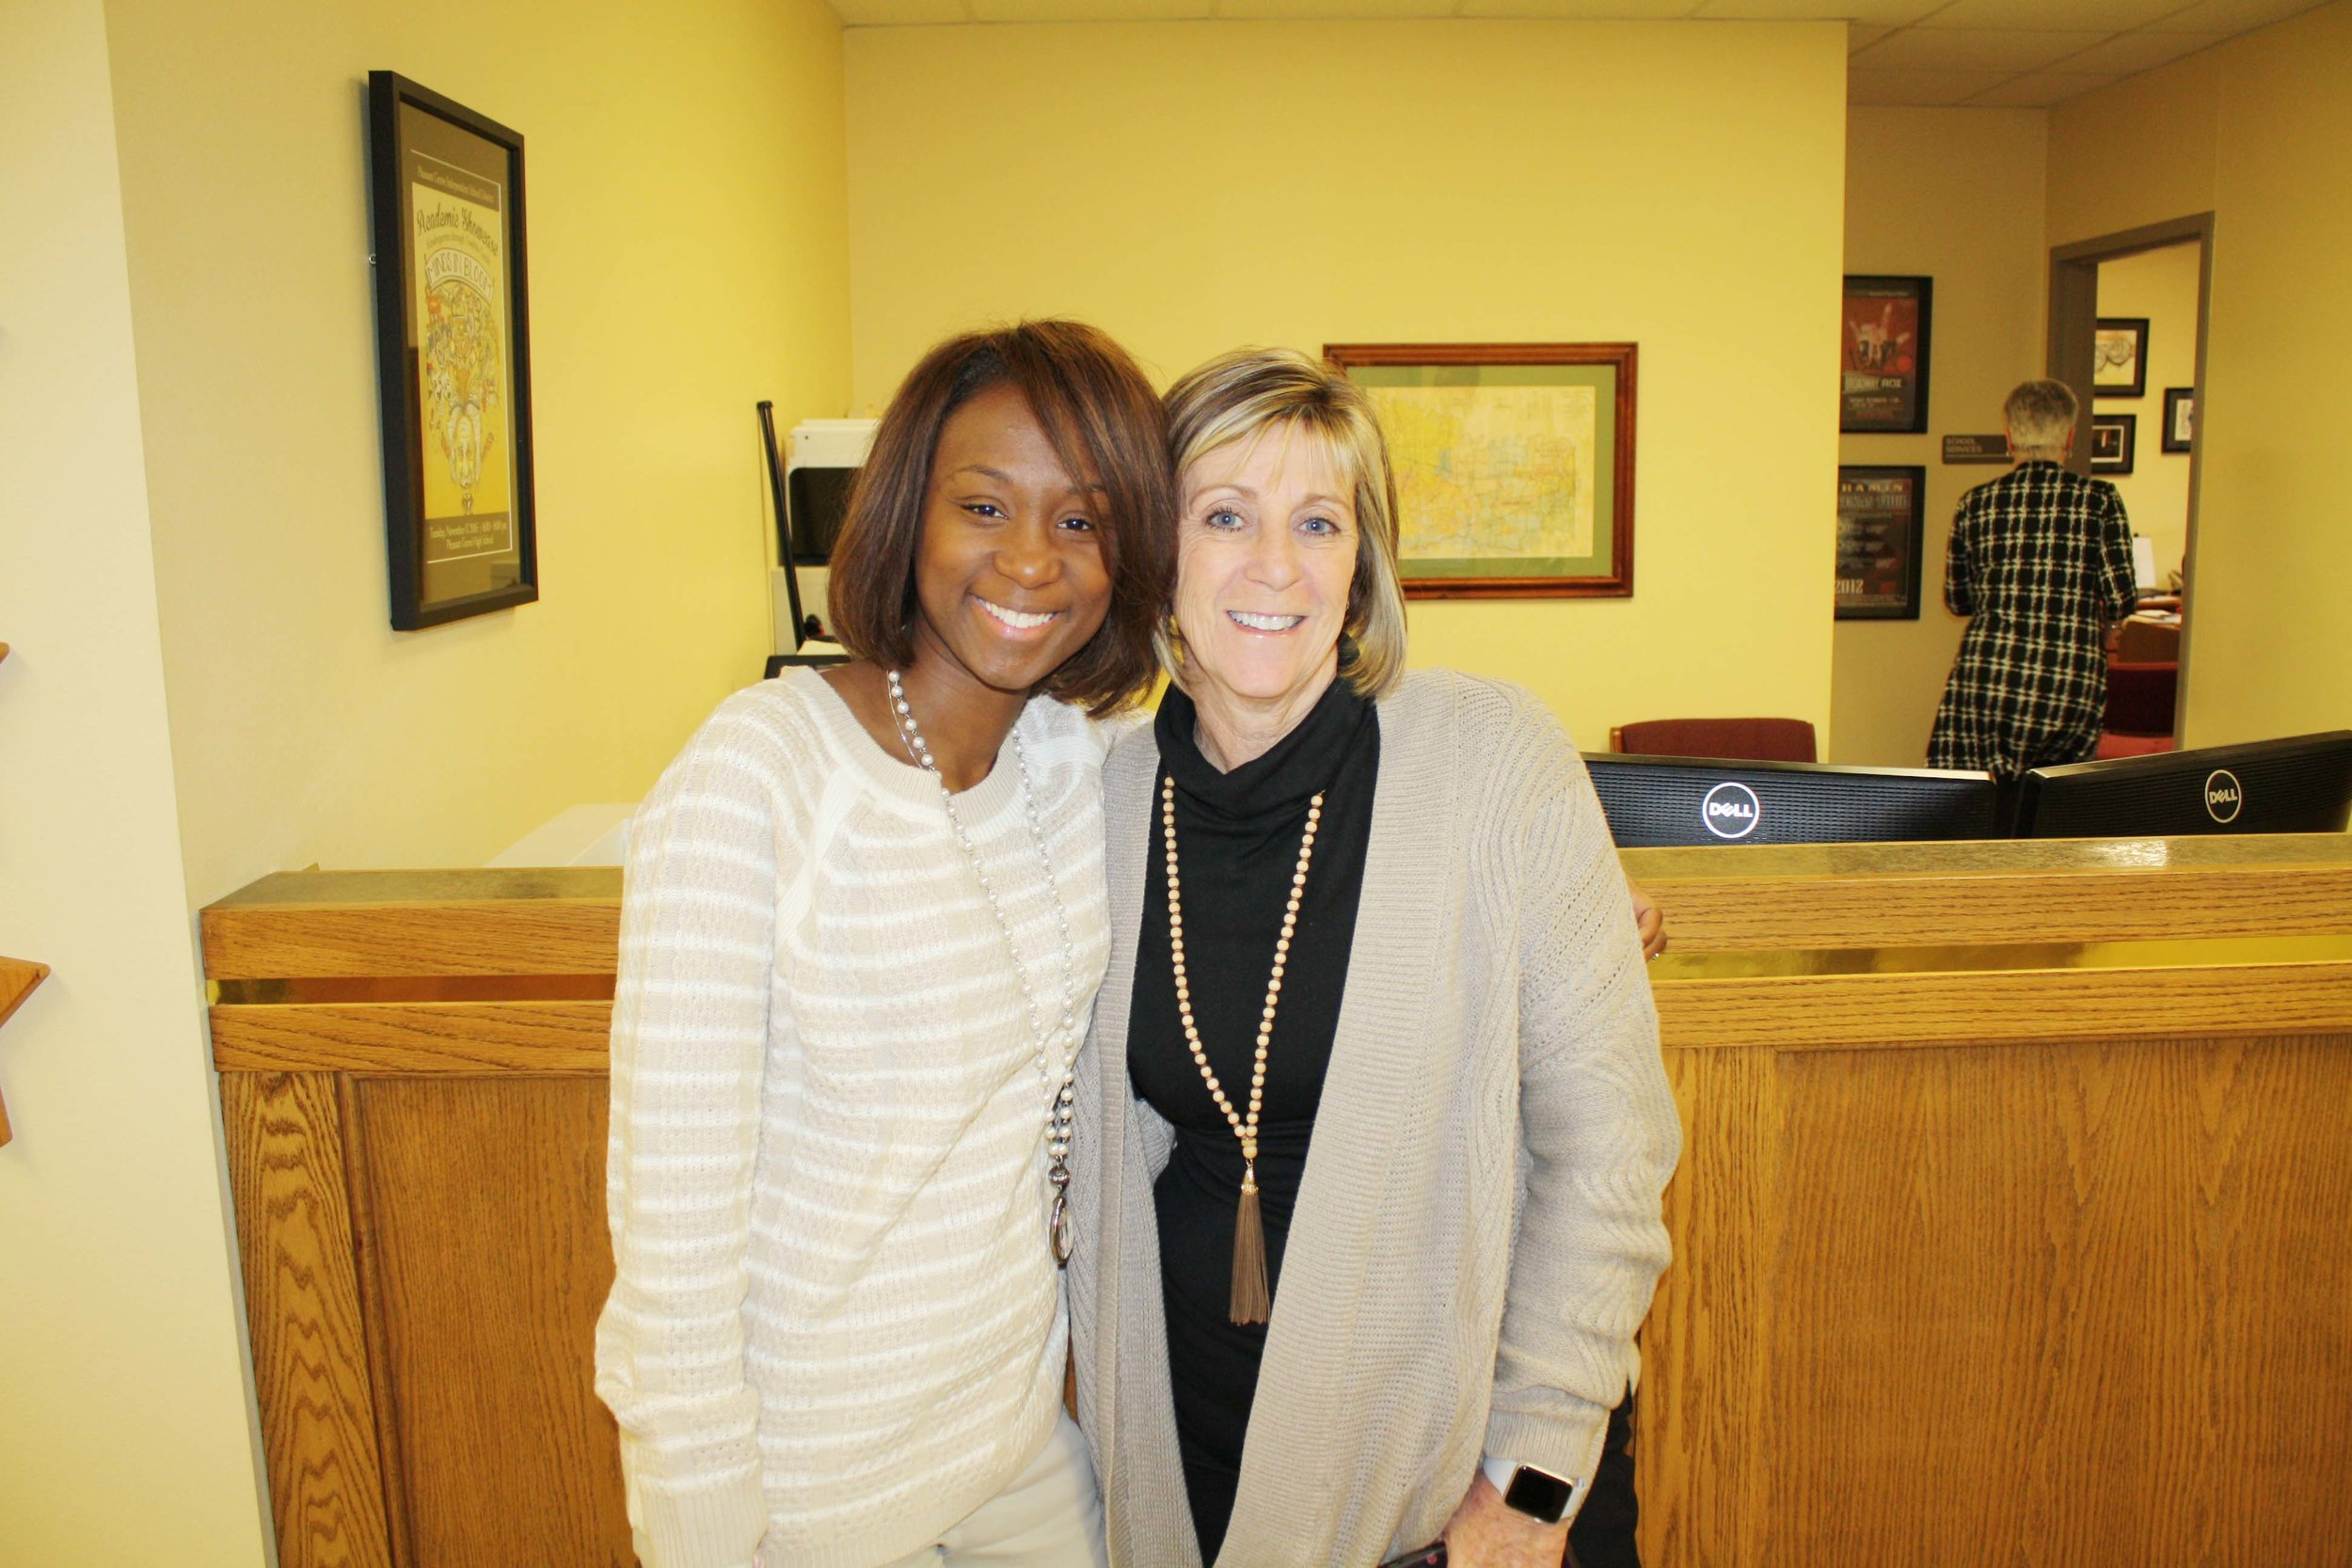 Lamoya Burks and Pam Bradford